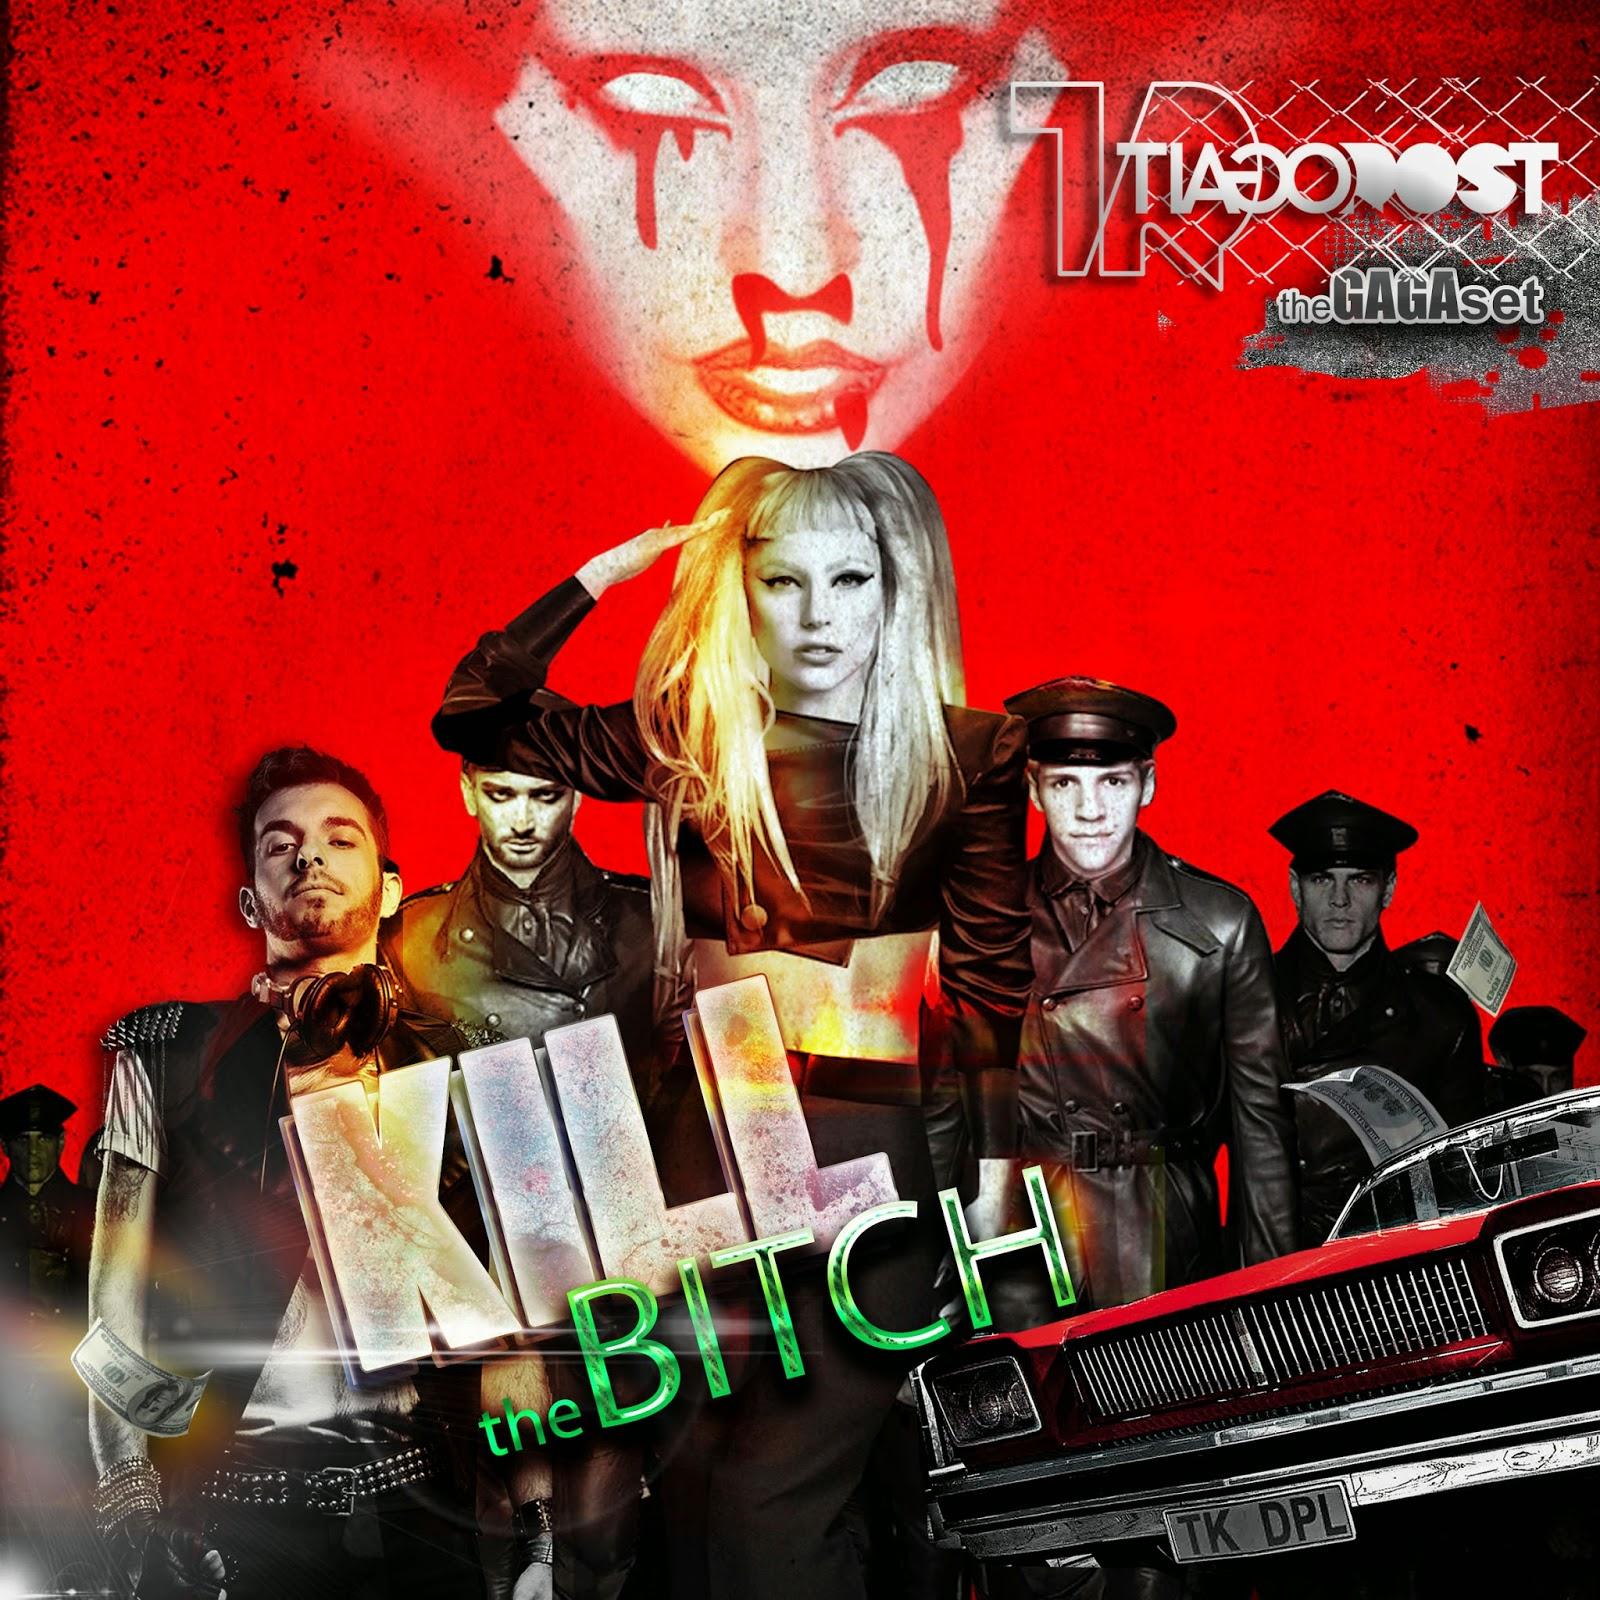 DJ Tiago Rost - KILL the BITCH !!! (theGAGAset)